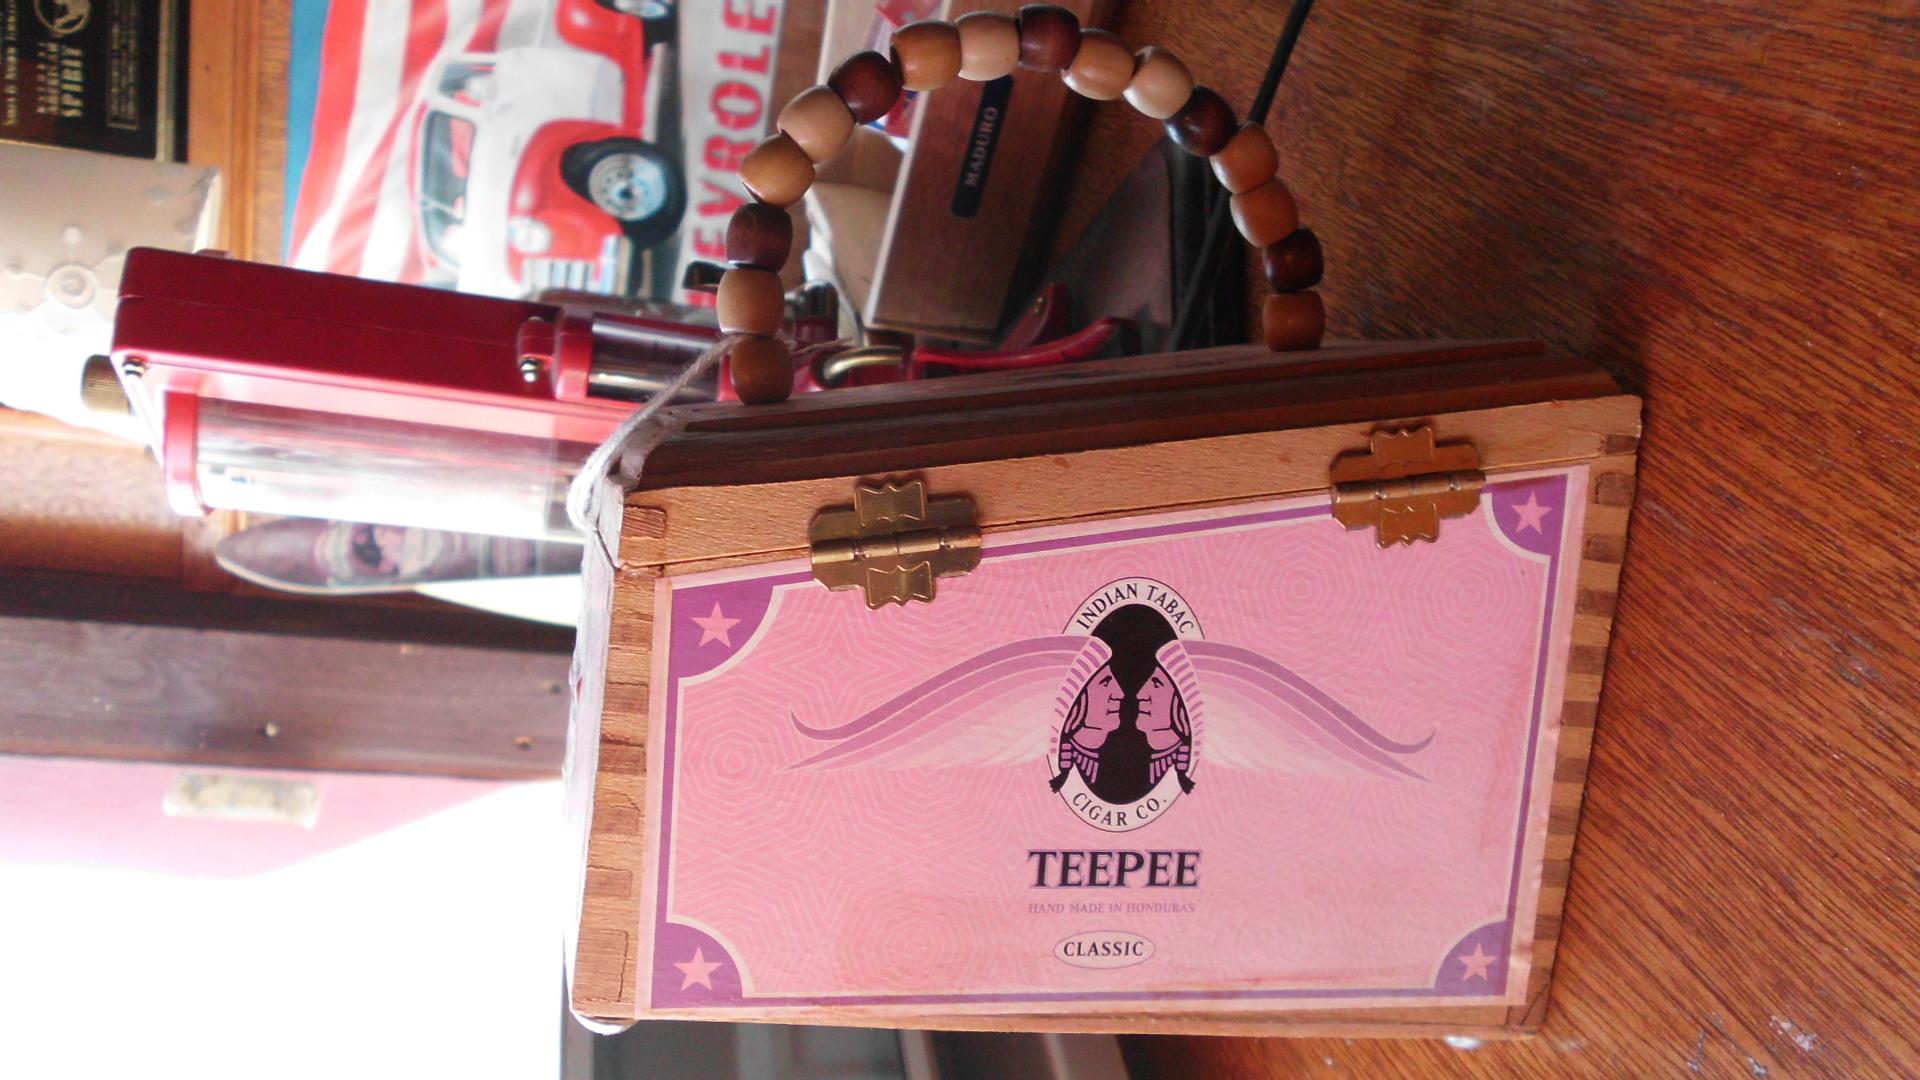 teepee_cigar_box_purse_zebra_lined_purses_and_handbags_2.JPG